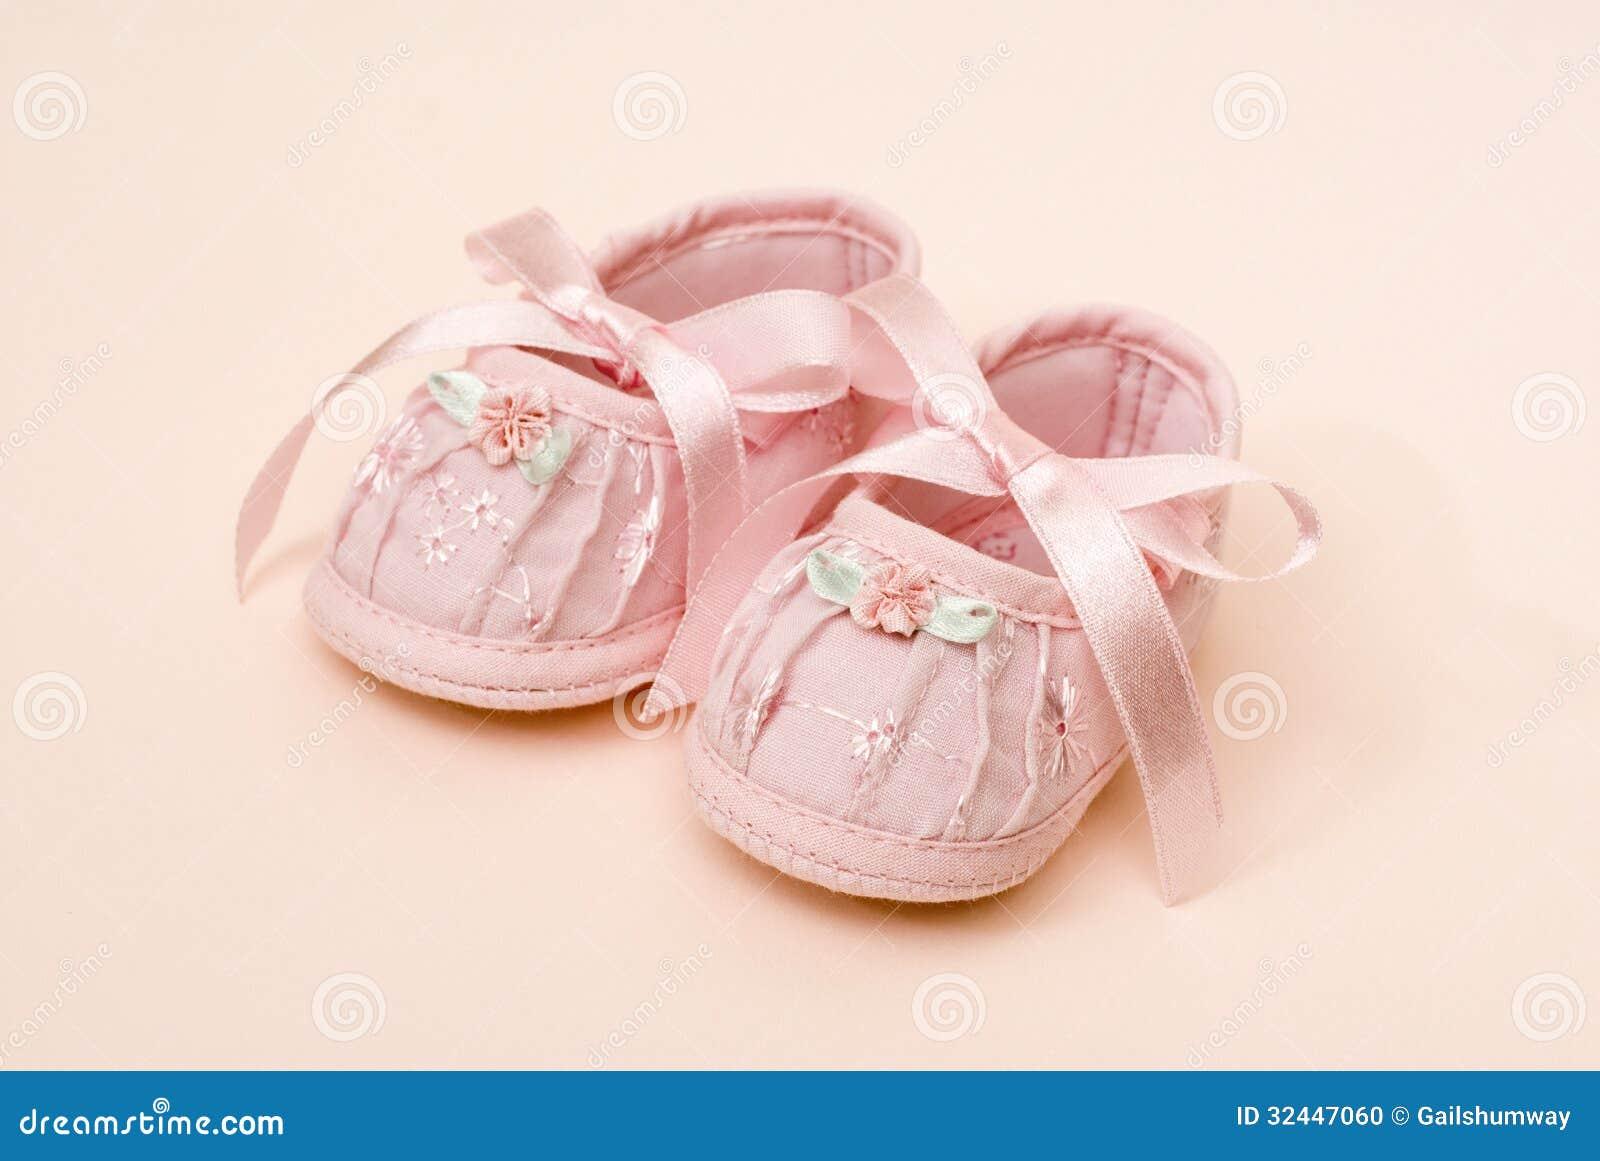 5d4c2902b902 Pink Baby Booties Stock Images - Download 2